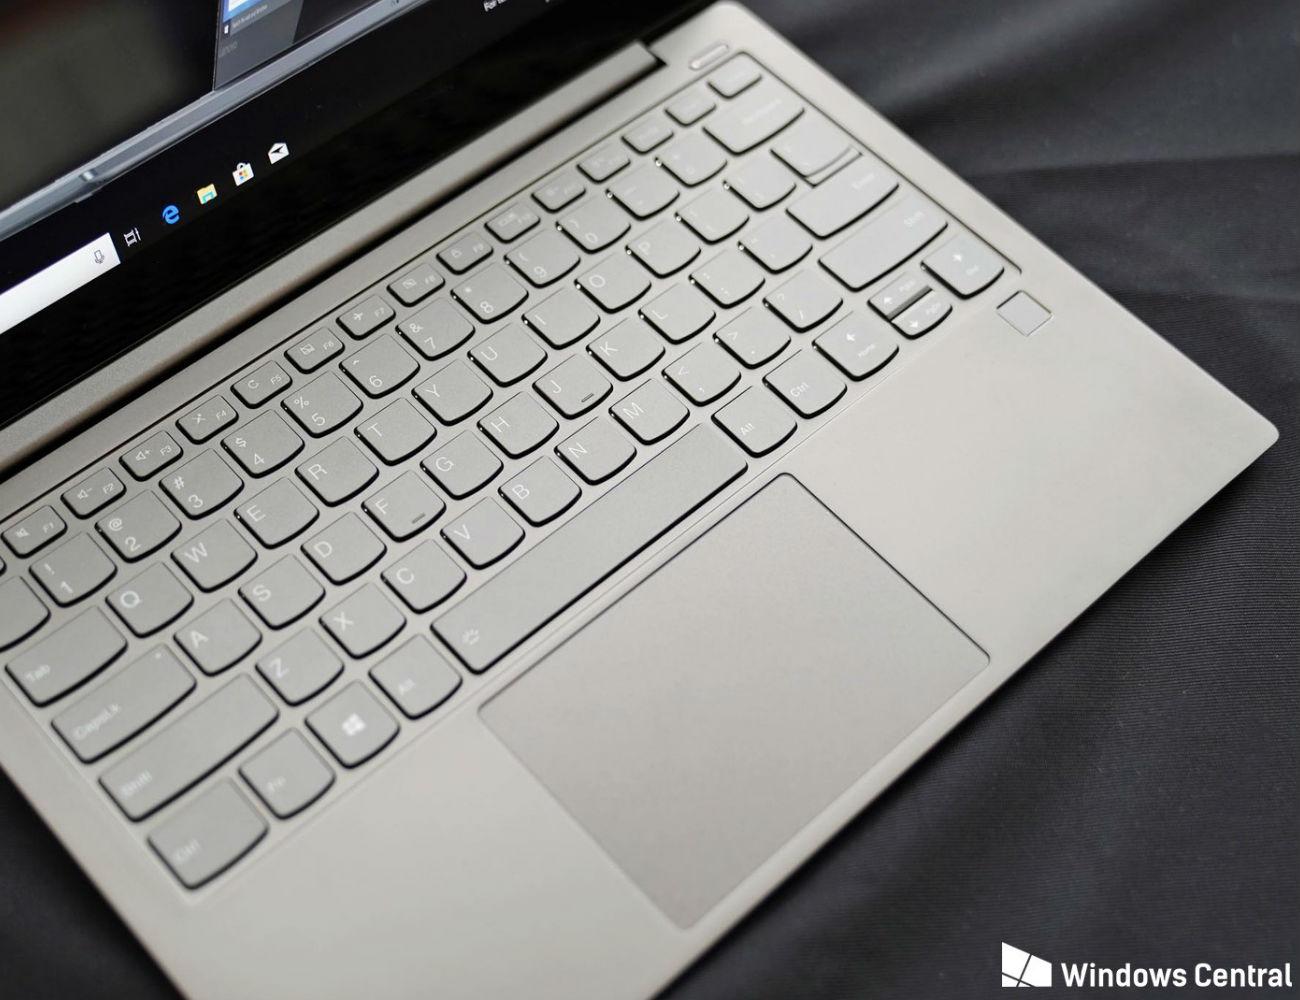 Lenovo Yoga S730 Laptop